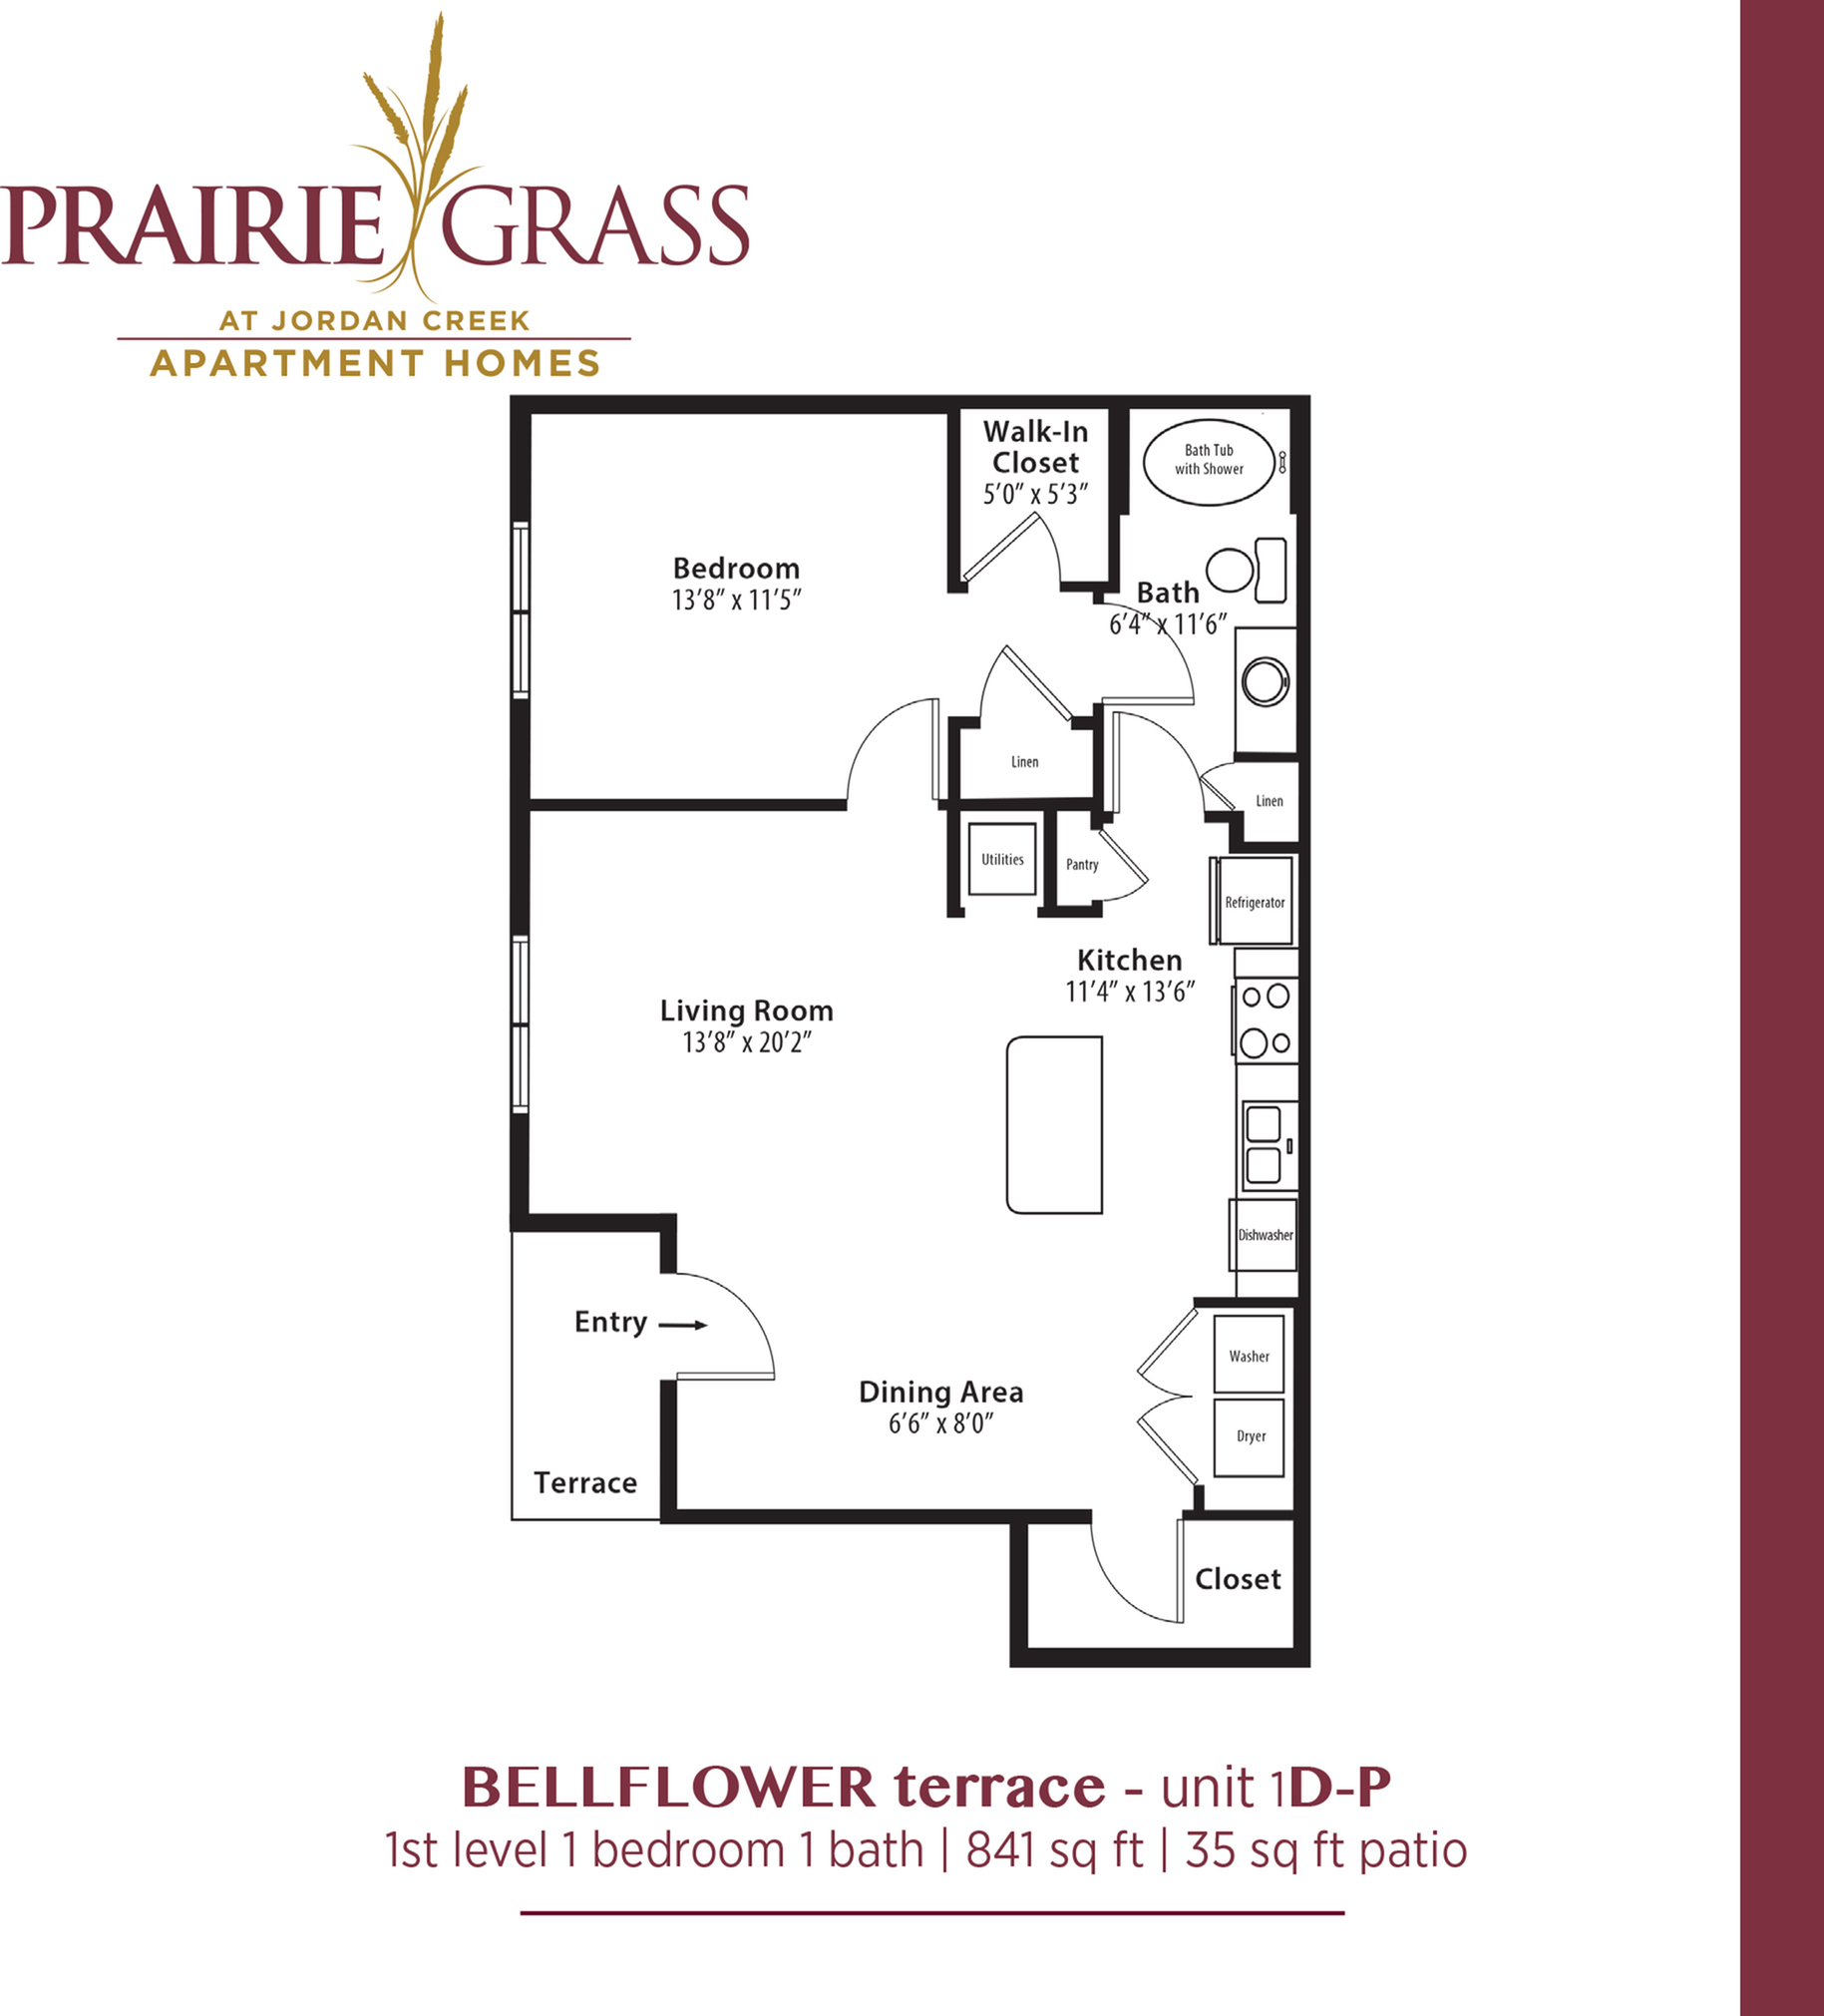 Bellflower Terrace - Lower 1 Bedroom with Patio